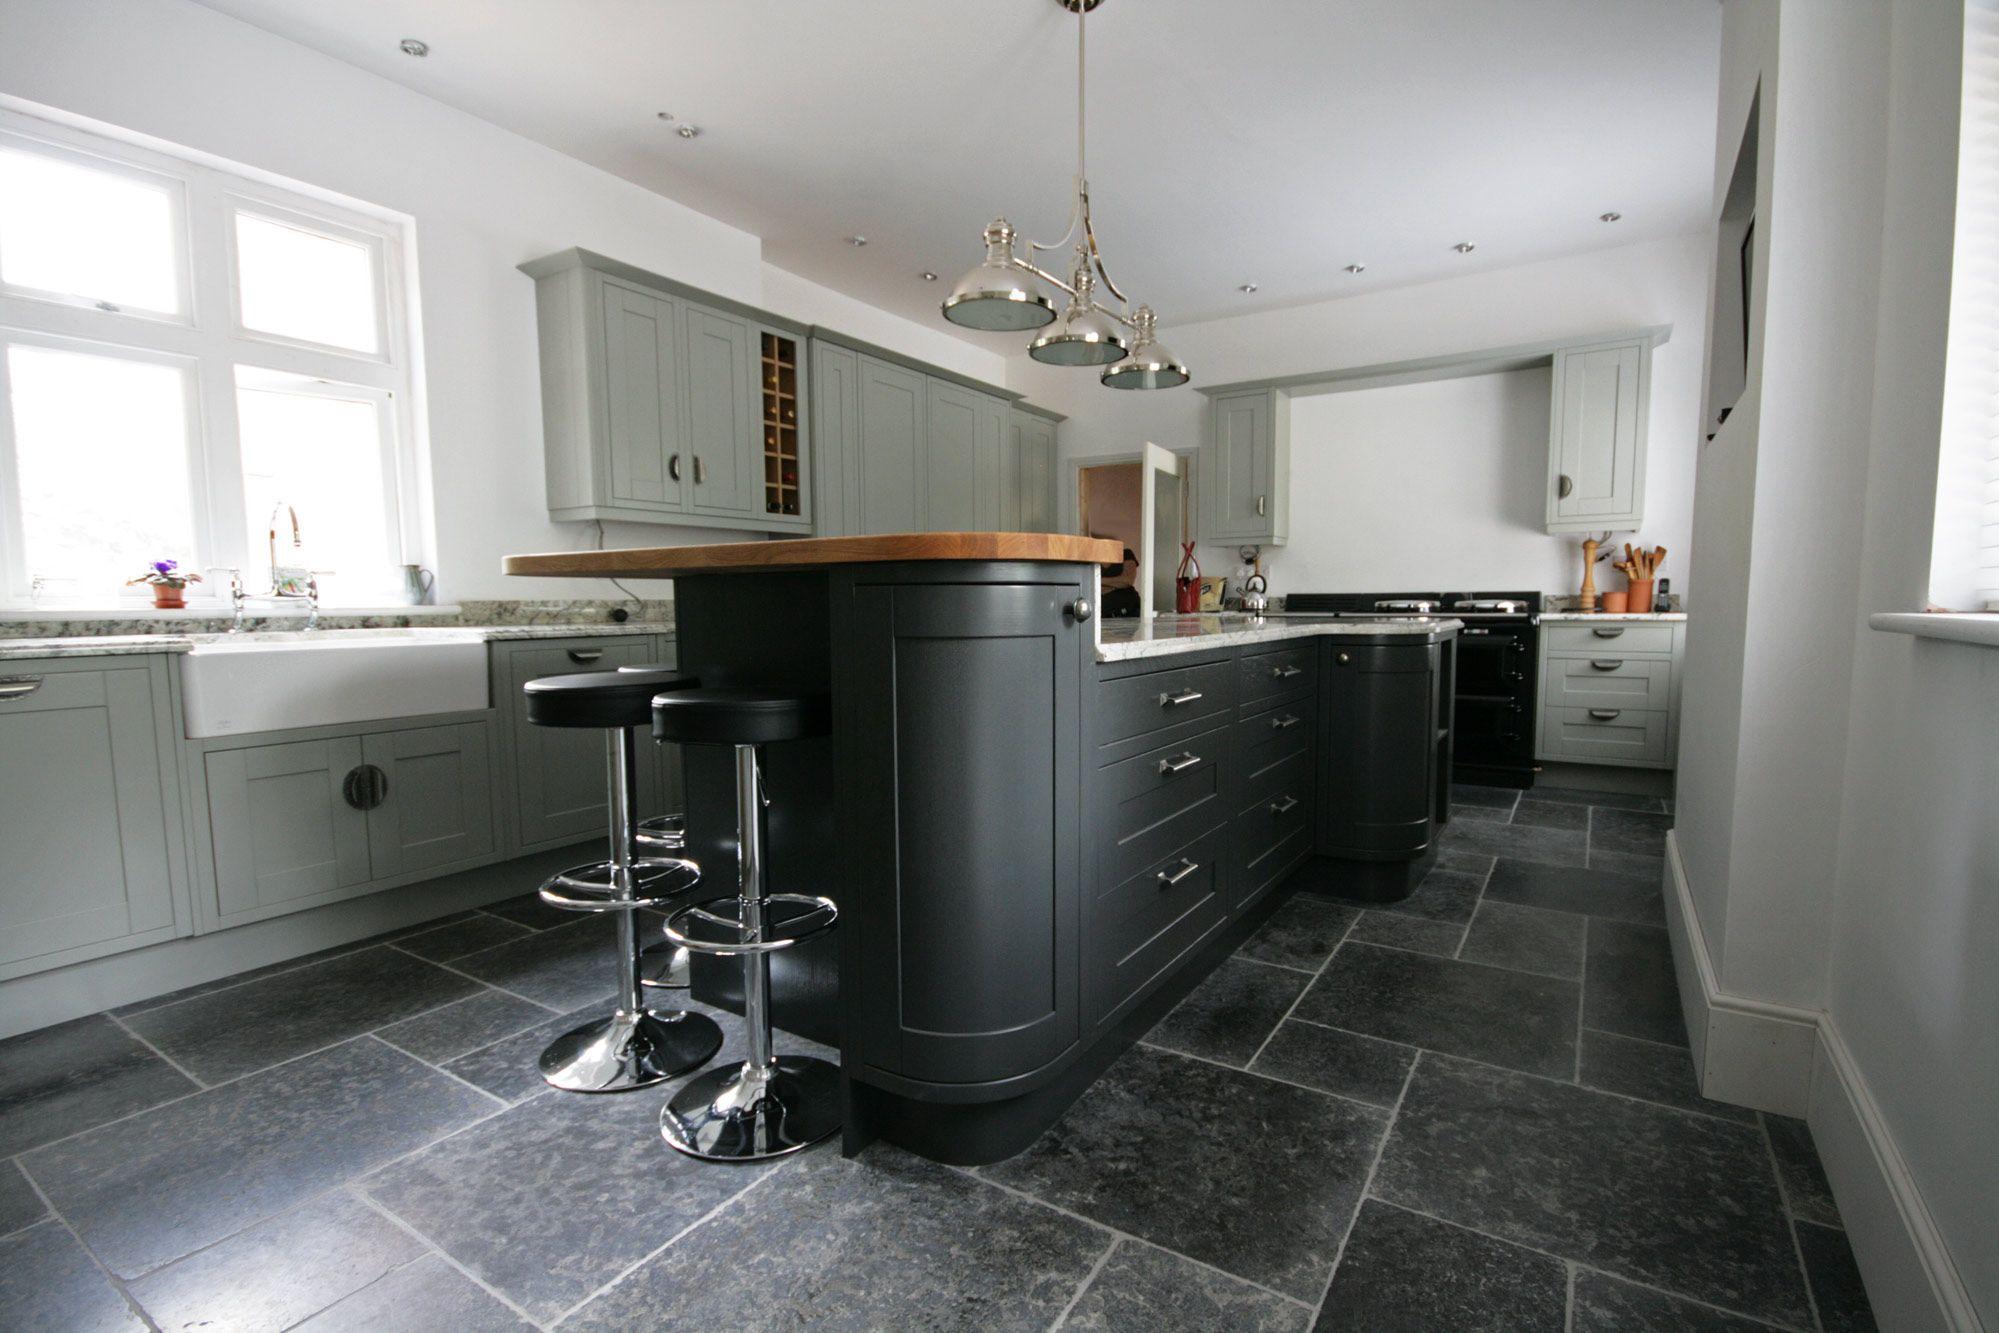 Picture of kitchen millstone limestone flooring tiles lovely picture of kitchen millstone limestone flooring tiles doublecrazyfo Gallery